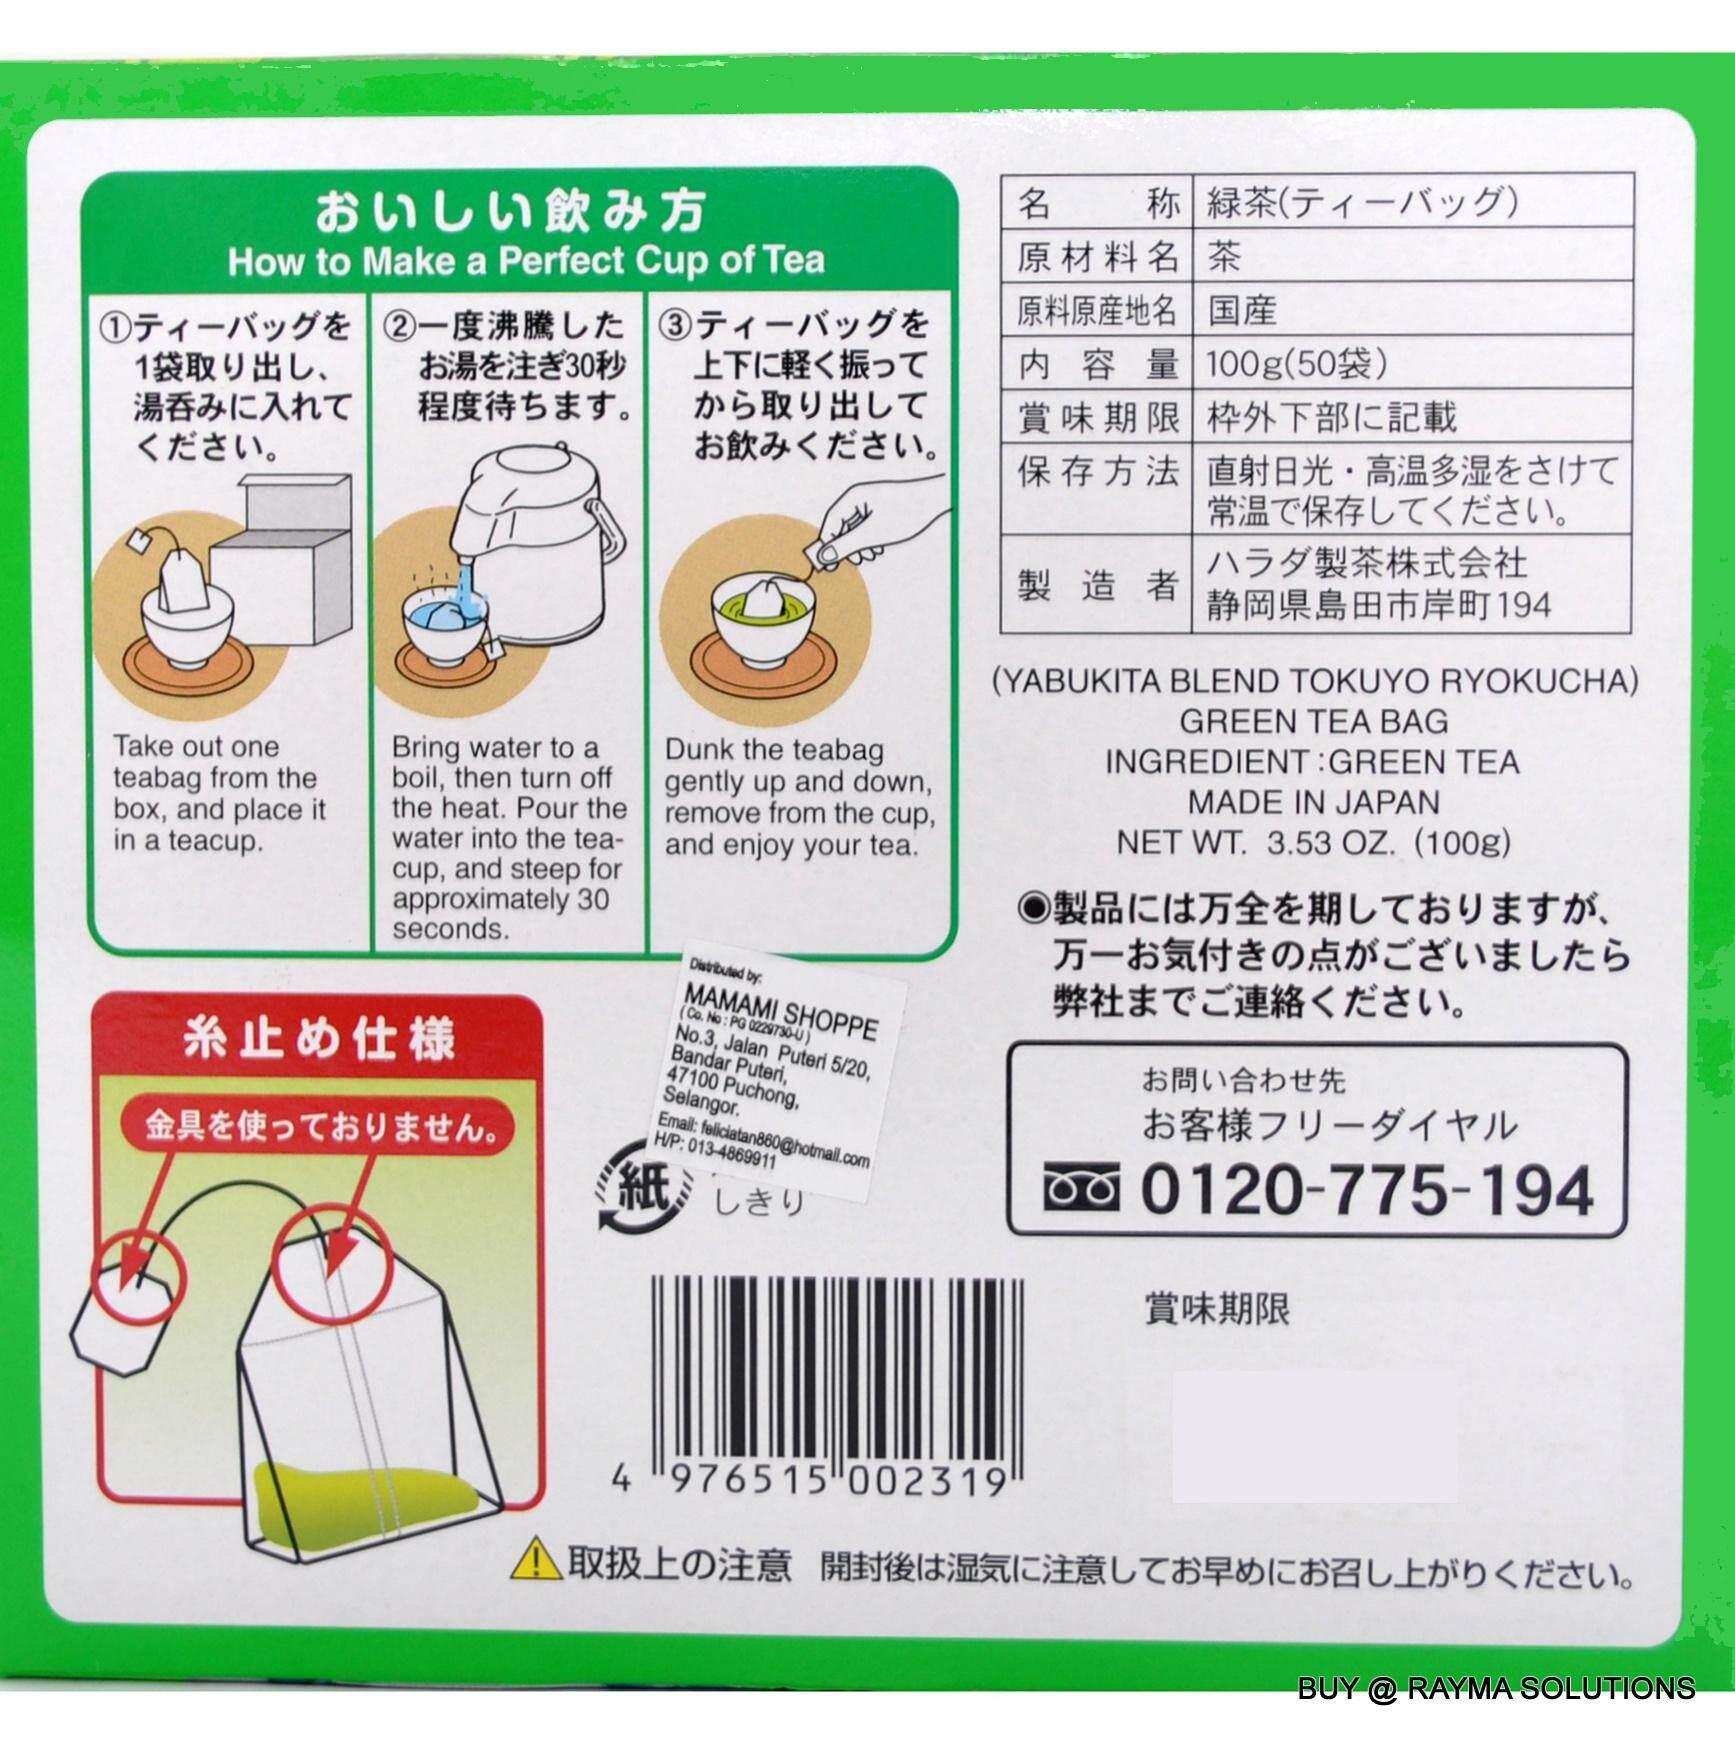 [ PROMO SET ] HARADA Yabukita Blend Authentic Japanese Green Tea